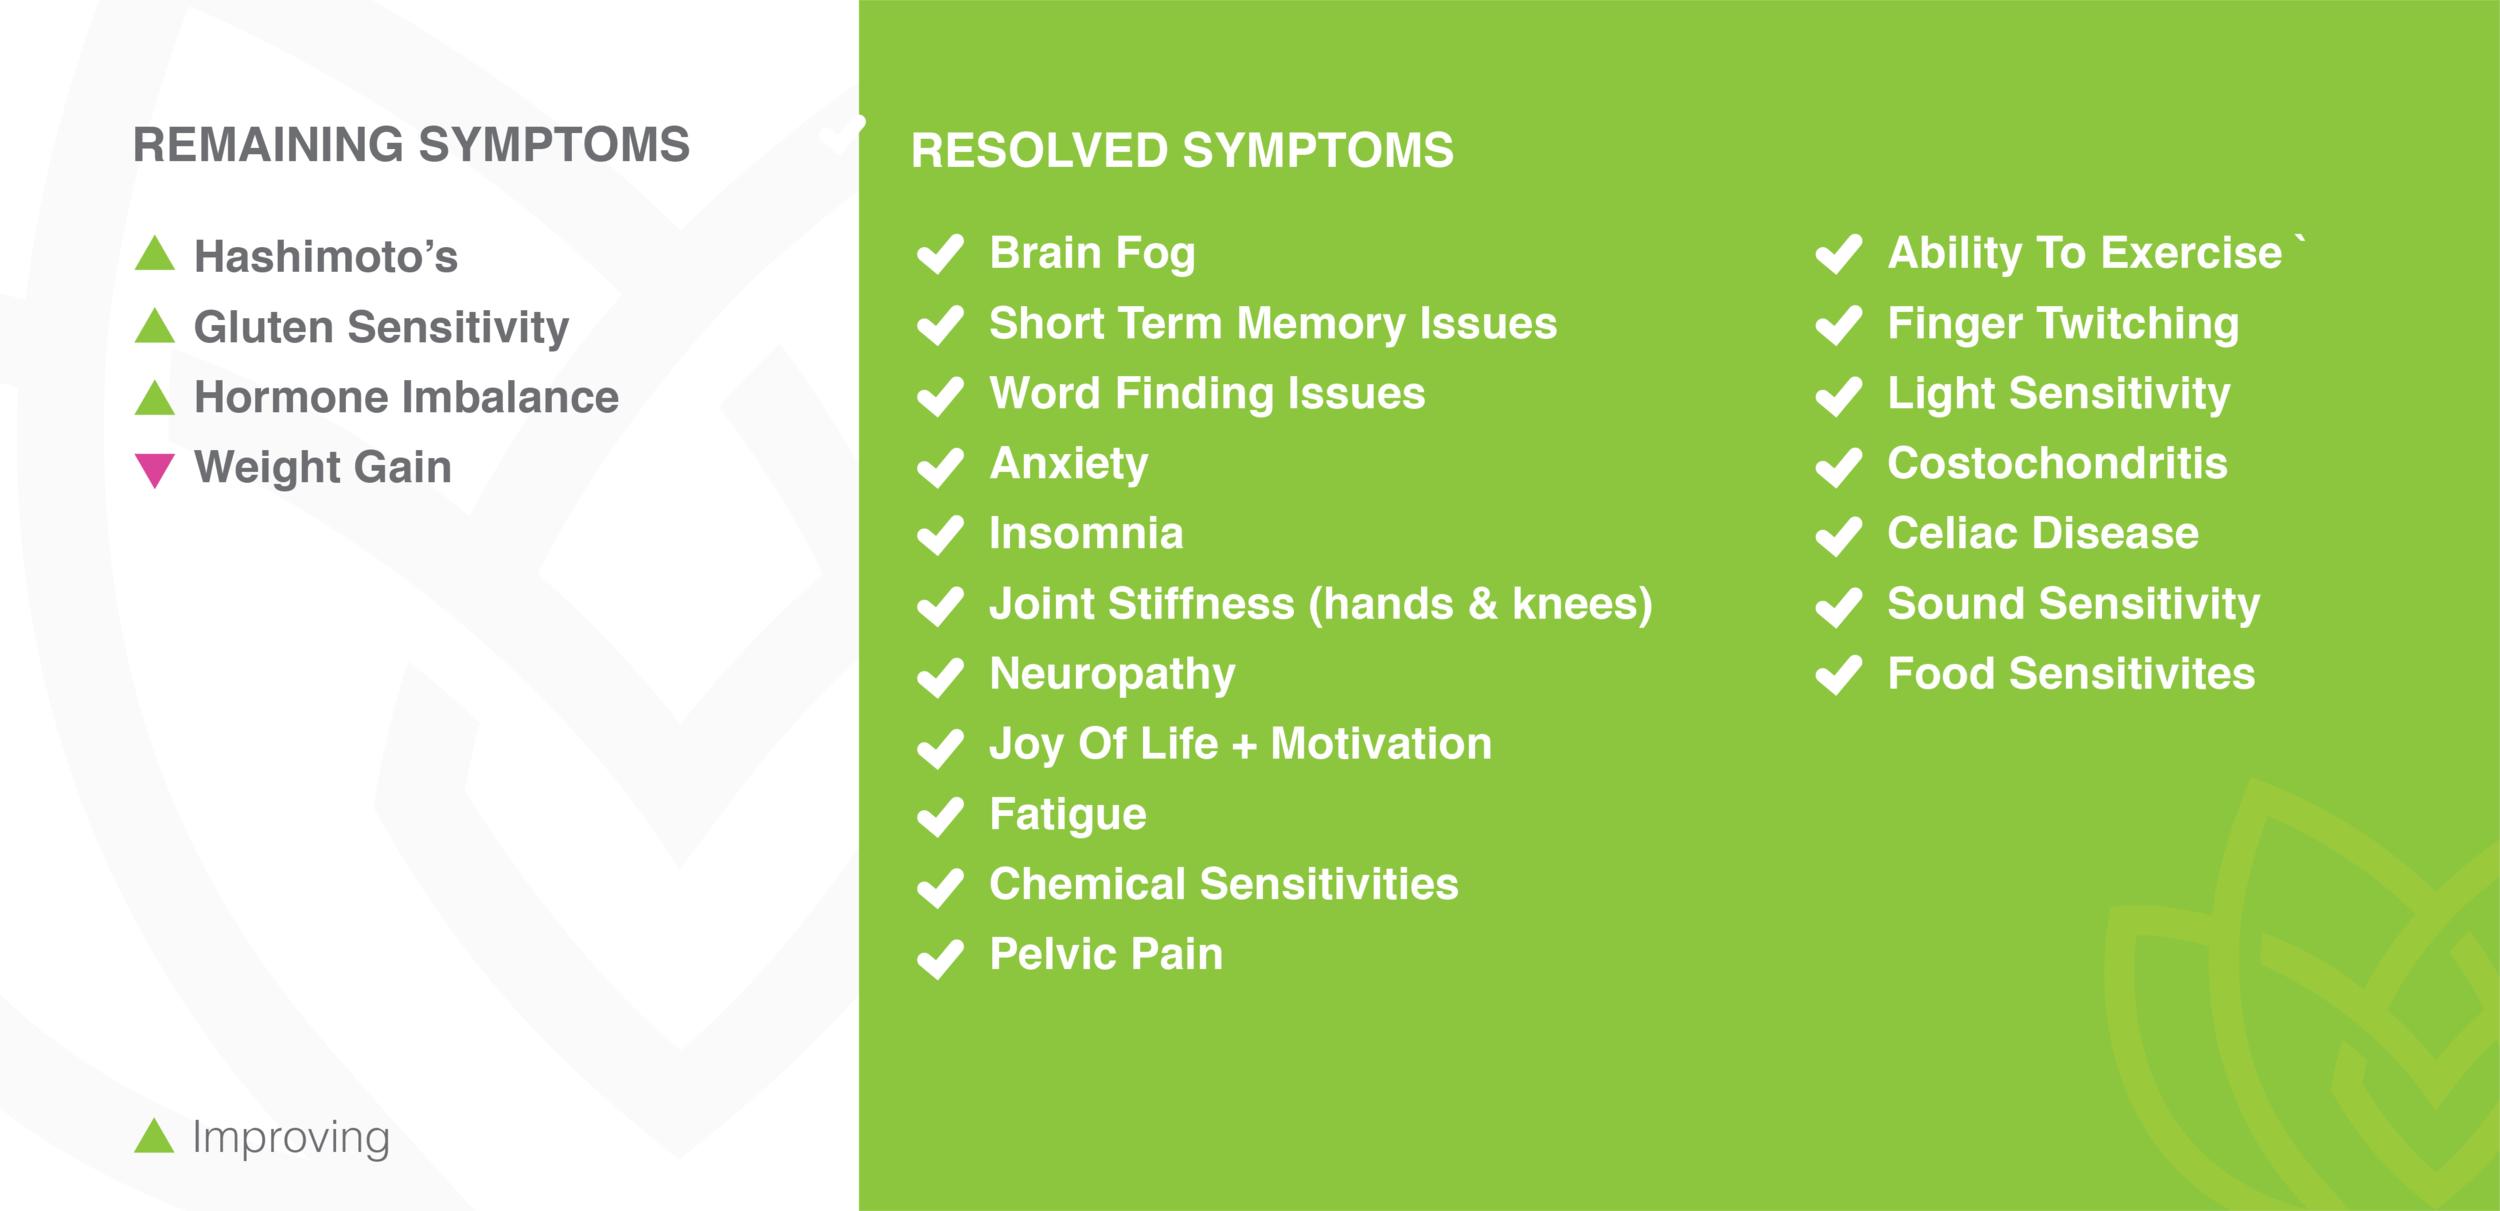 SymptomCheckList2-05.png